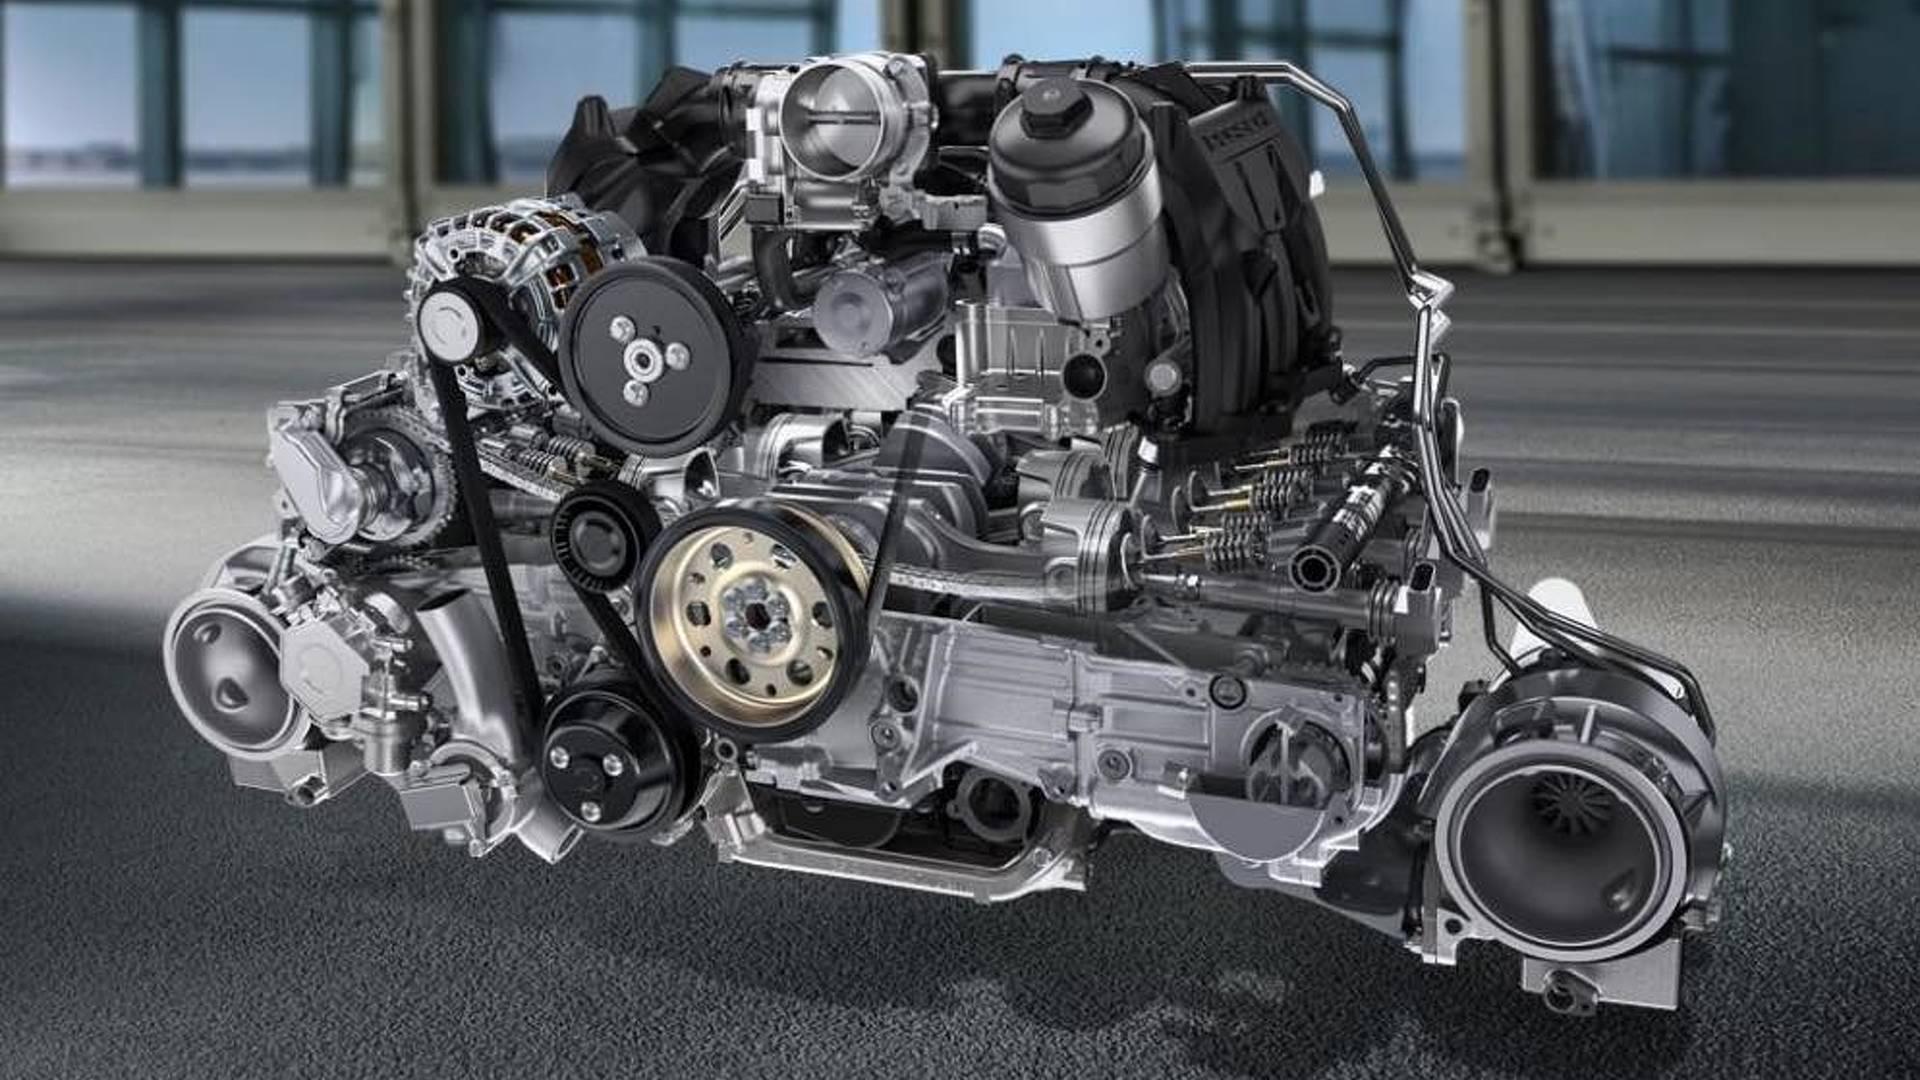 hight resolution of 5 8 twin turbo engine